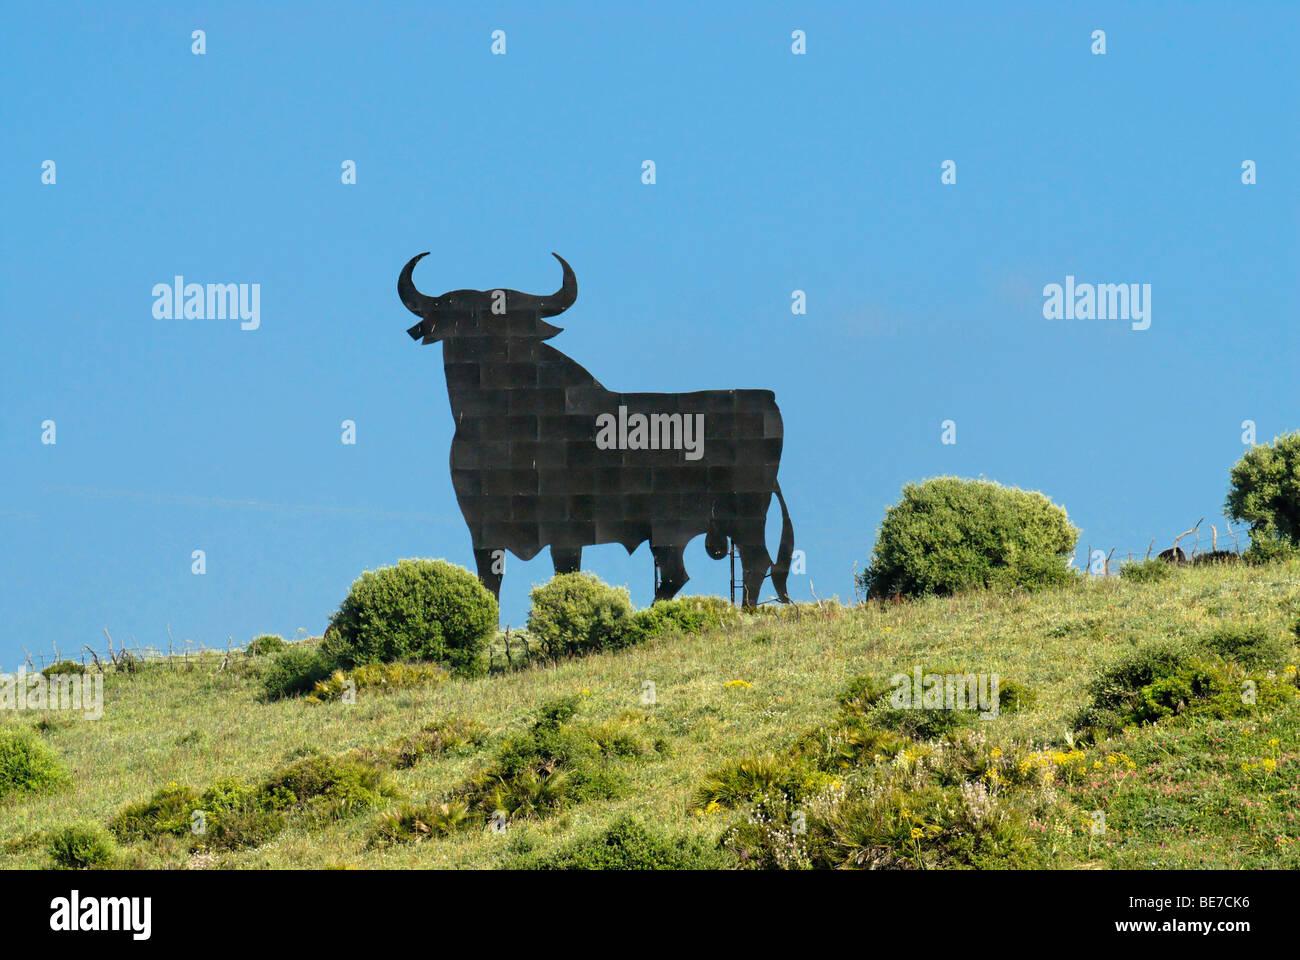 Toro de Osborne, el toro de Osborne, cerca de Cádiz, Andalucía, España, Europa Imagen De Stock